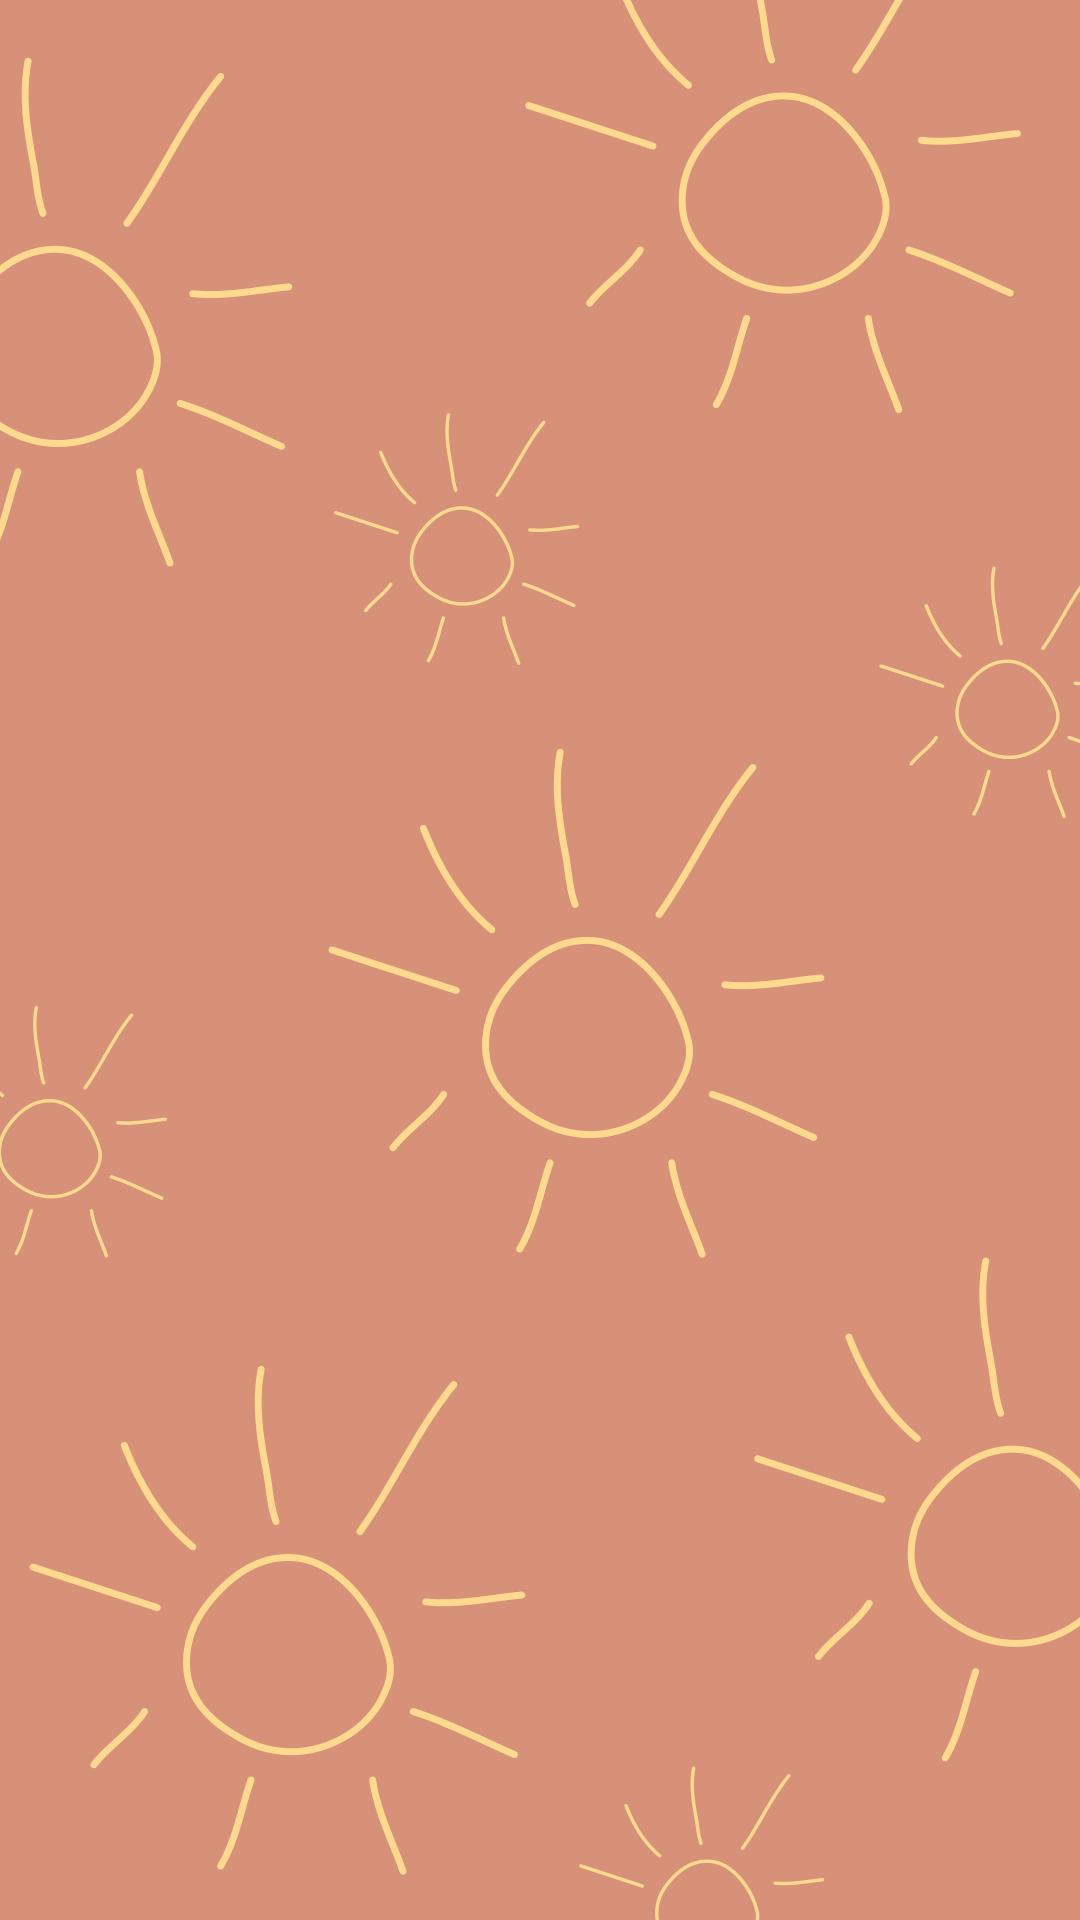 Dark Pink Wallpaper By Lara Gelders Graphic Wallpaper Boho Wallpaper Cute Patterns Wallpaper